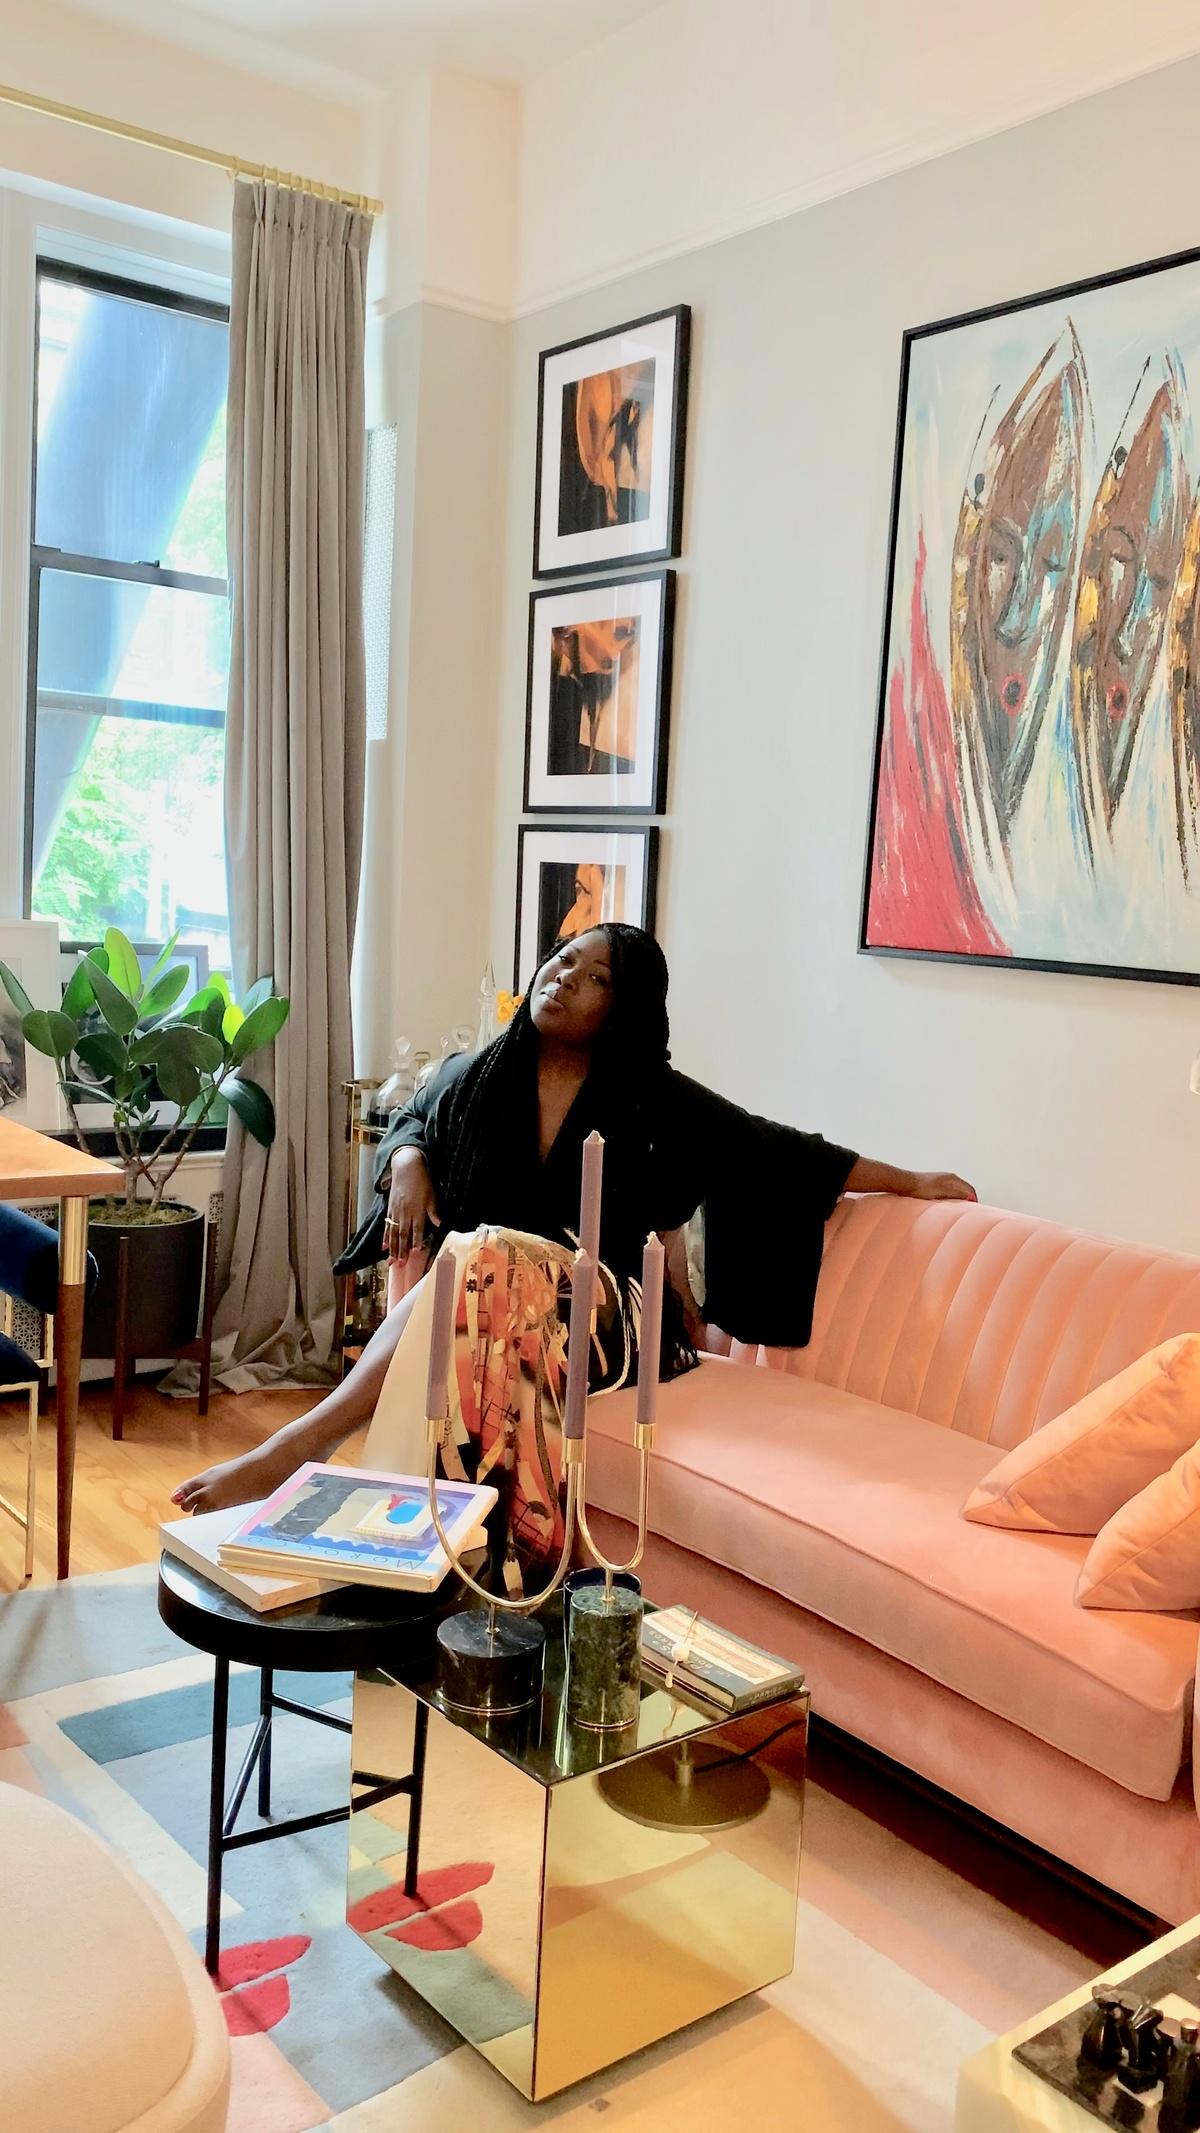 Natasha Nyanin in her apartment living room in Brooklyn